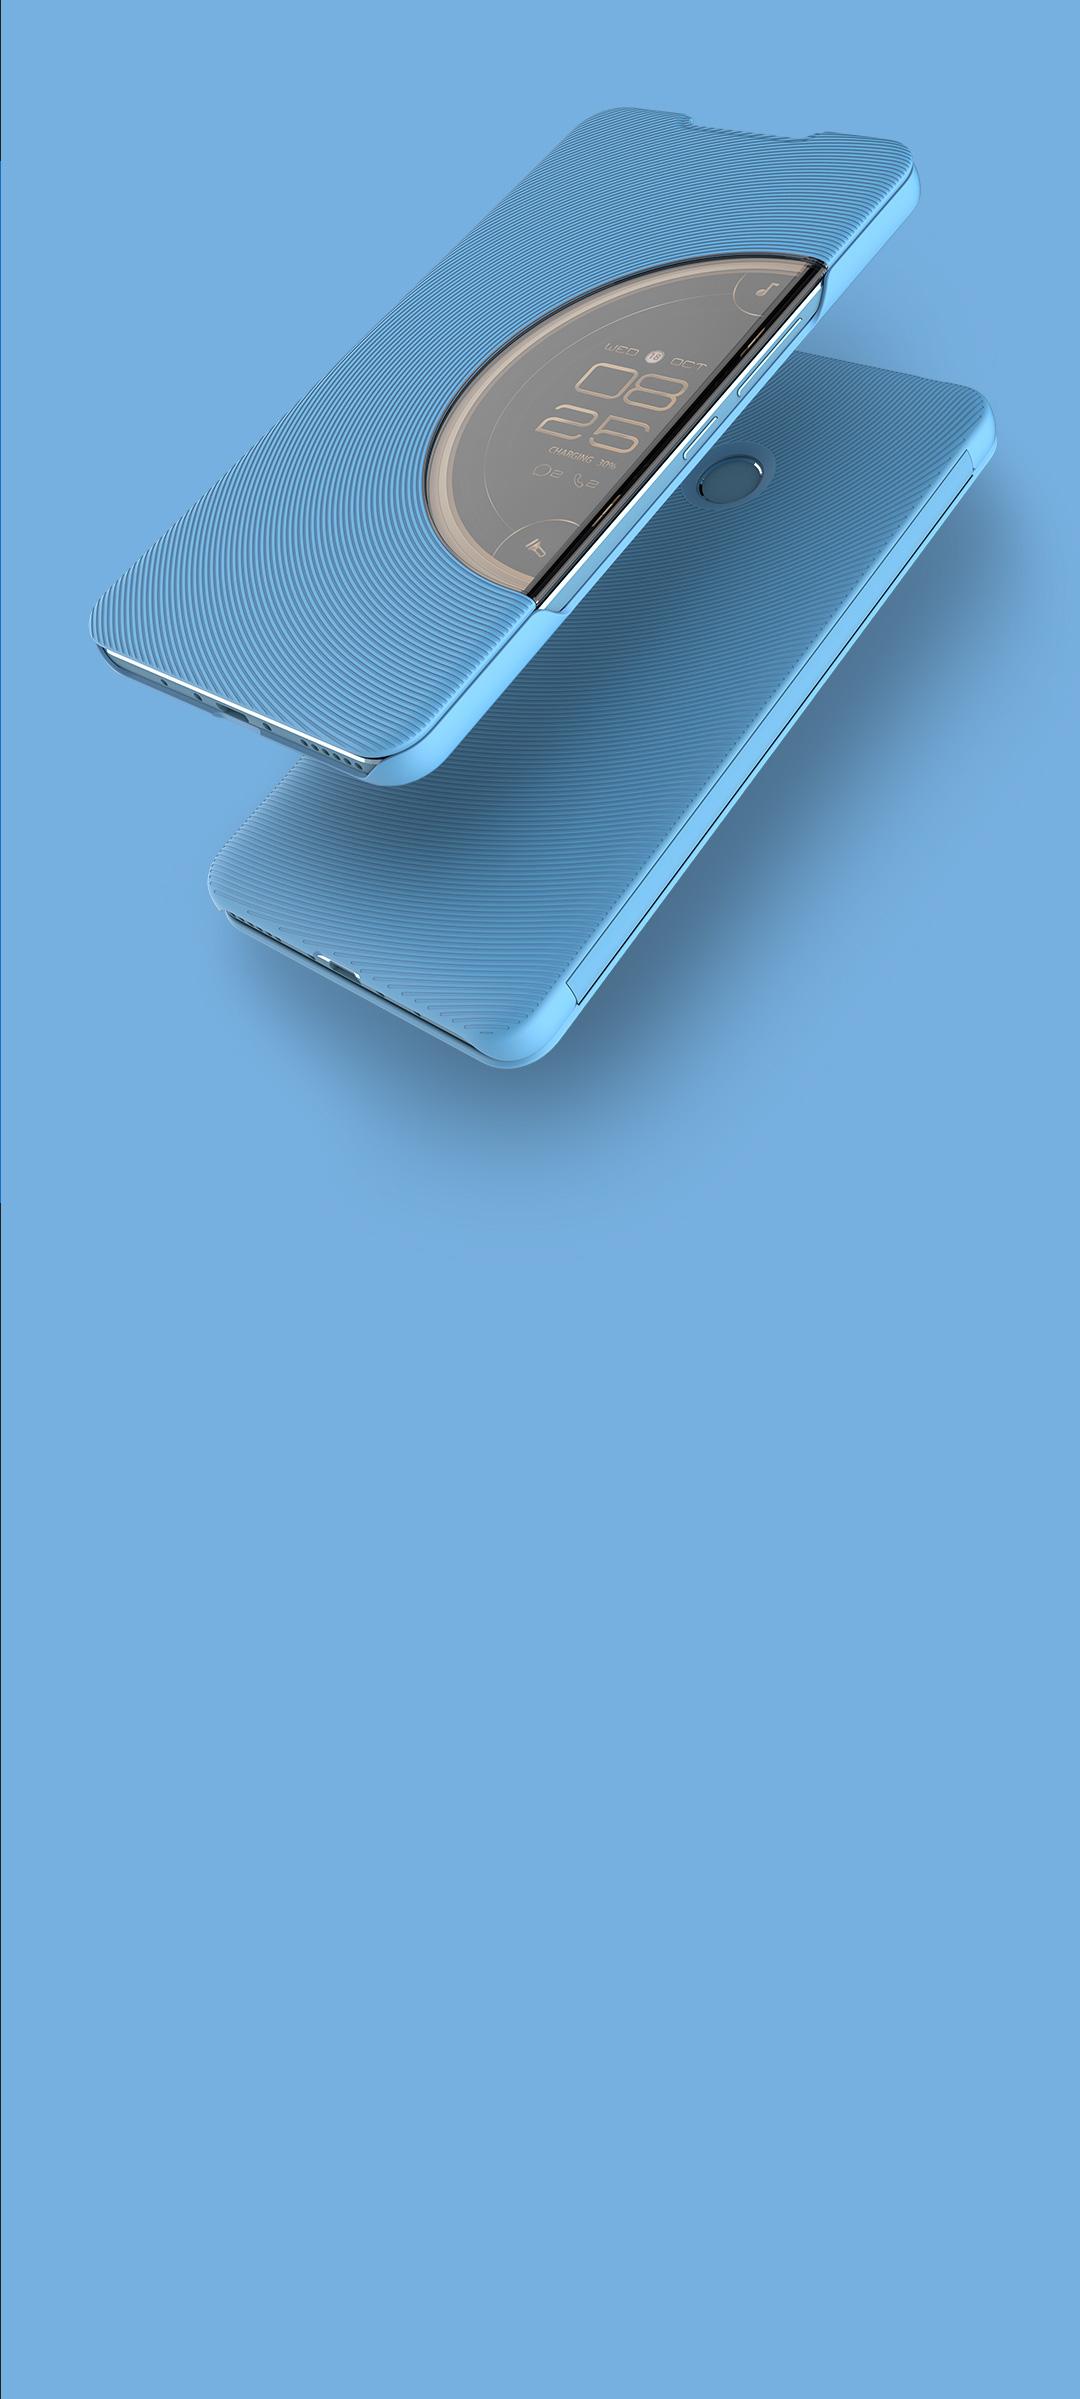 Camon CX Manchester City Limited Edition - TECNO Mobile